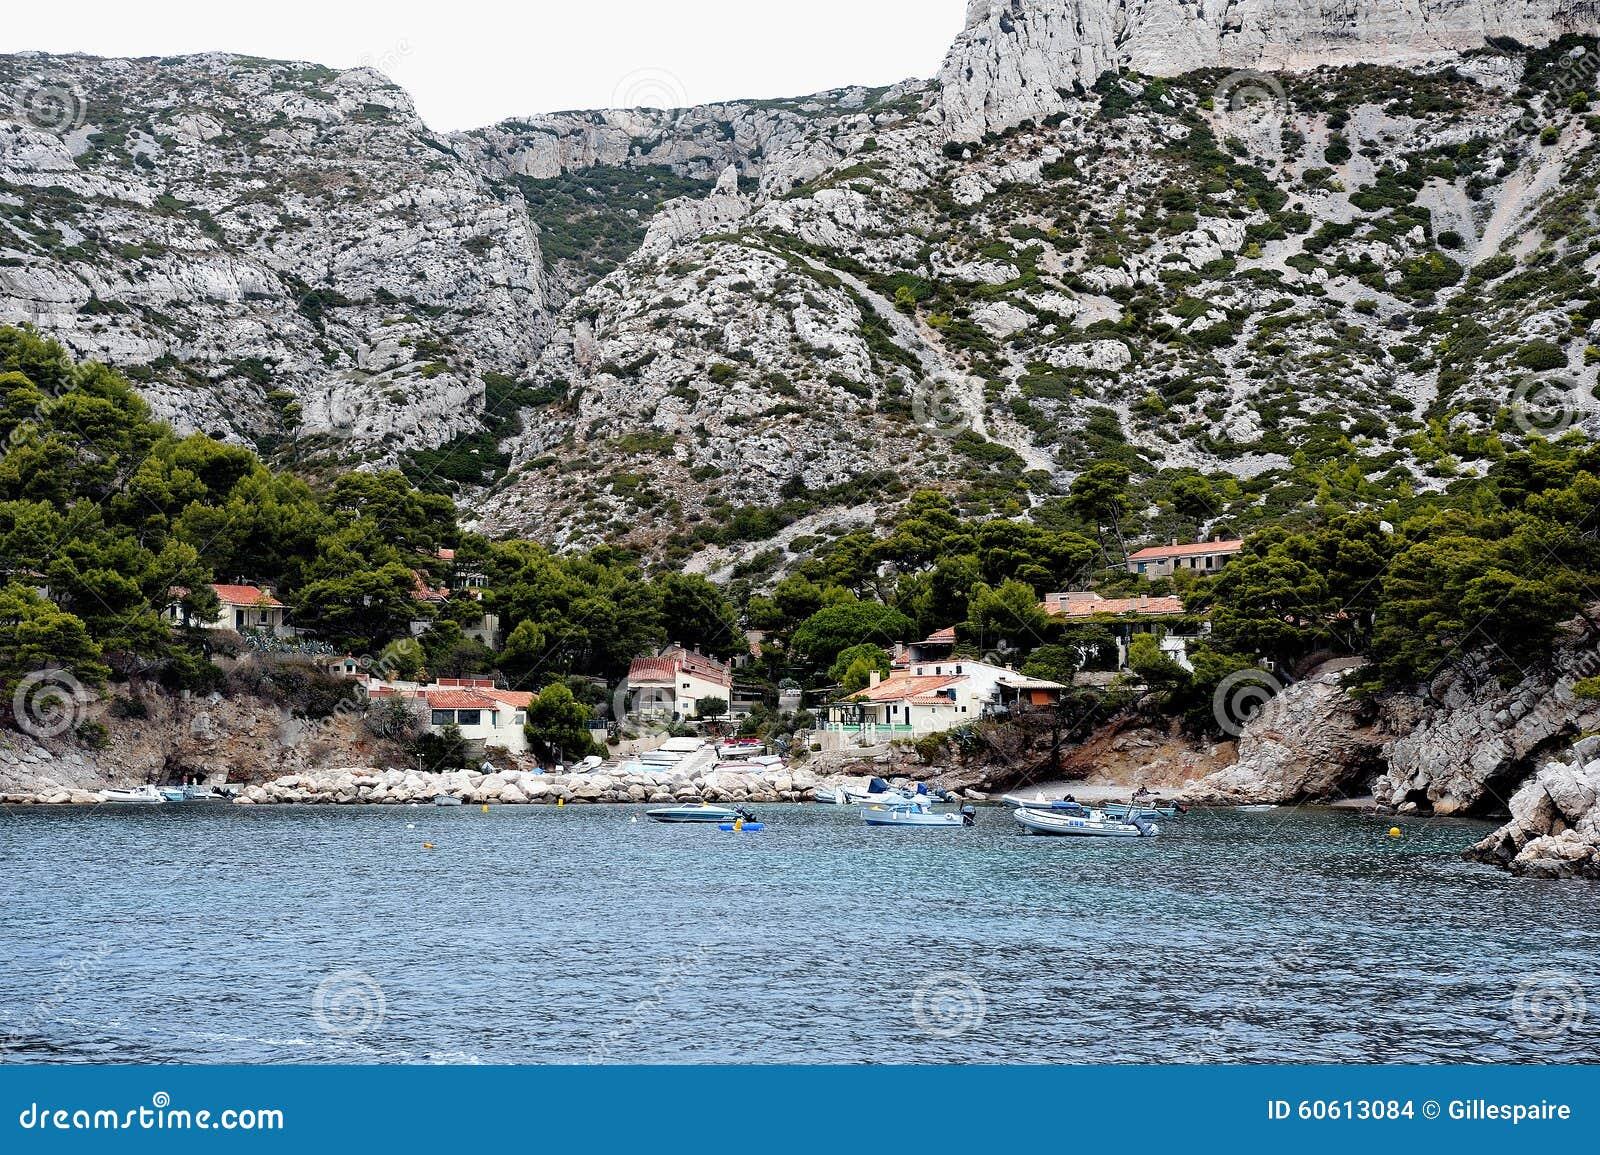 coastal landscape between cassis and marseille stock photo image 60613084. Black Bedroom Furniture Sets. Home Design Ideas